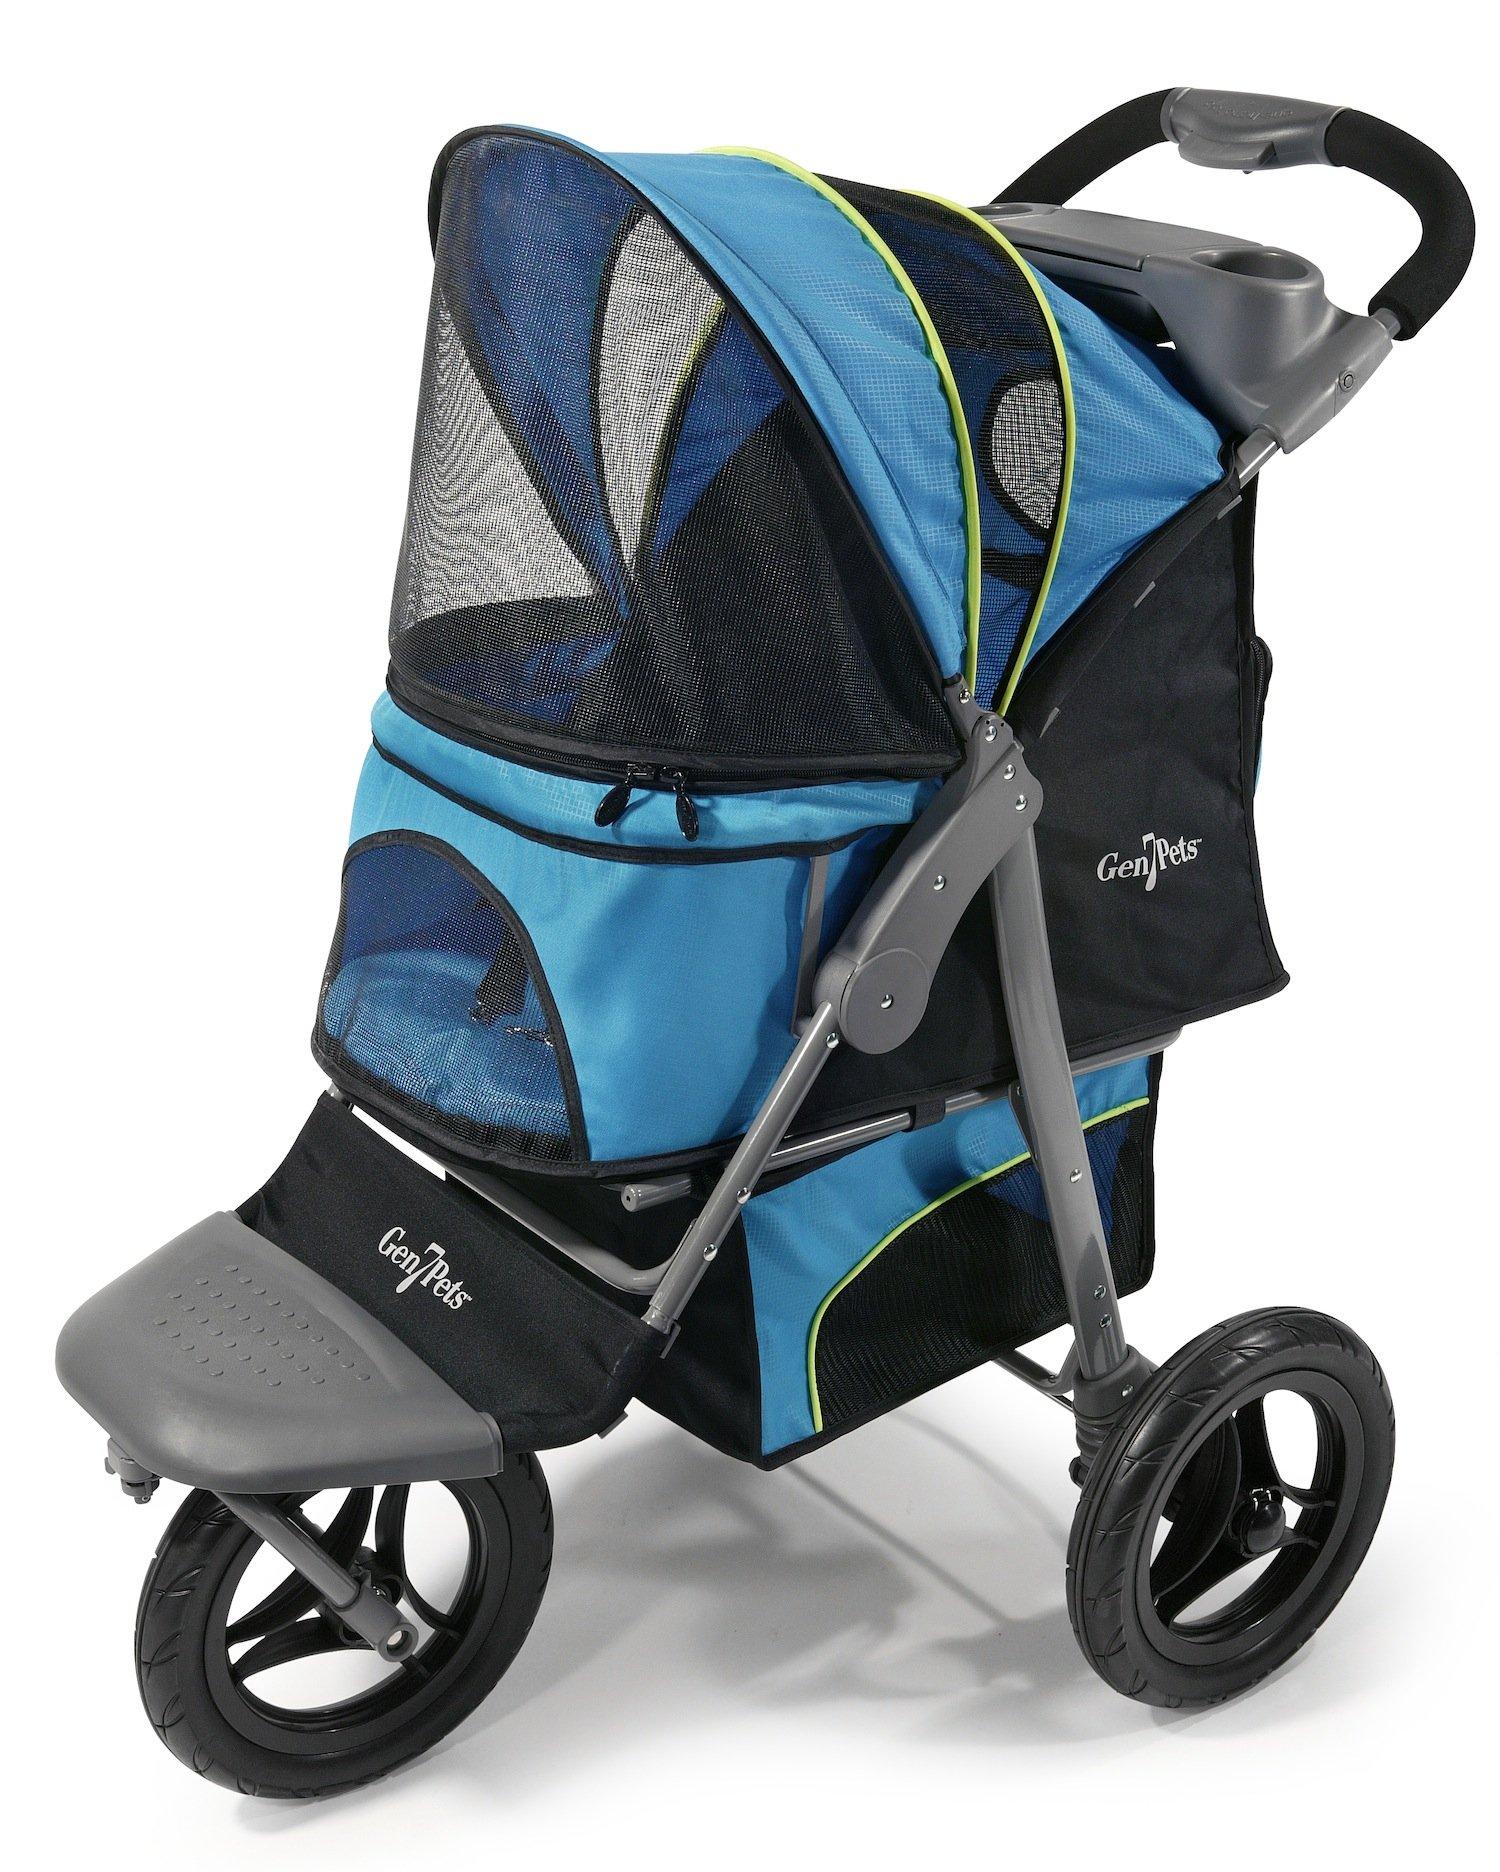 Gen7Pets G7 Jogger Pet Stroller, Trailblazer Blue